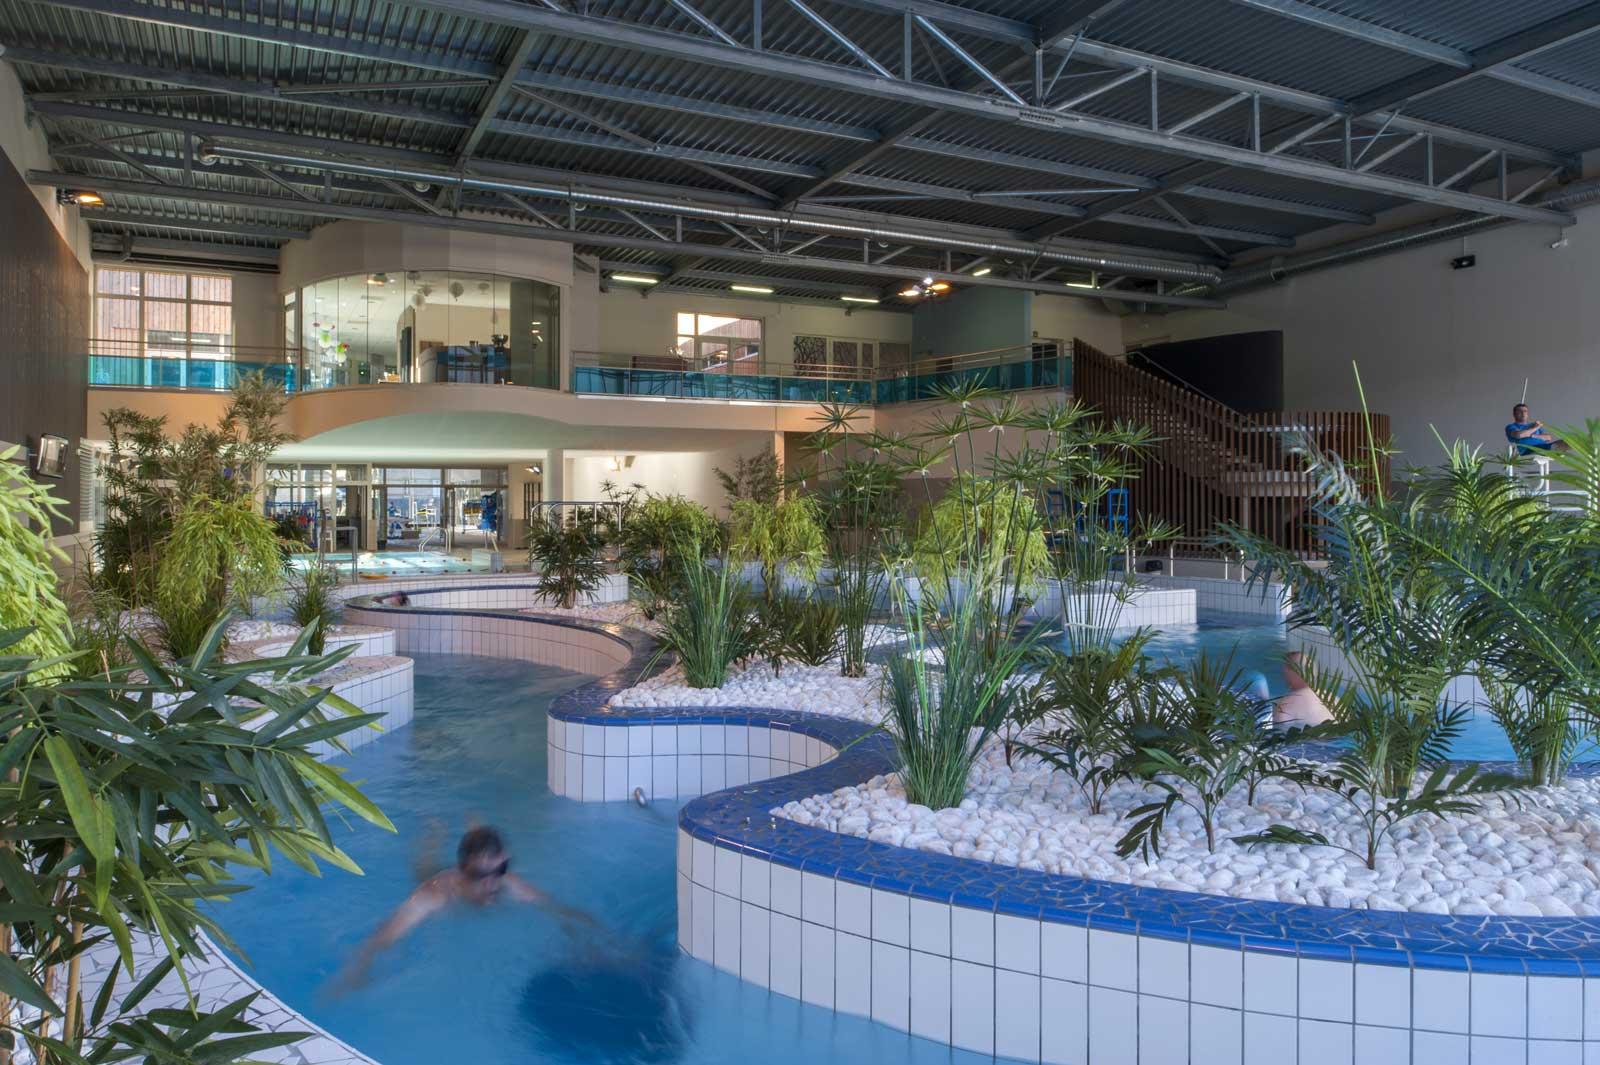 La Piscine - Espace Aquatique - Ville De Brive encequiconcerne Piscine De Brive La Gaillarde Brive La Gaillarde